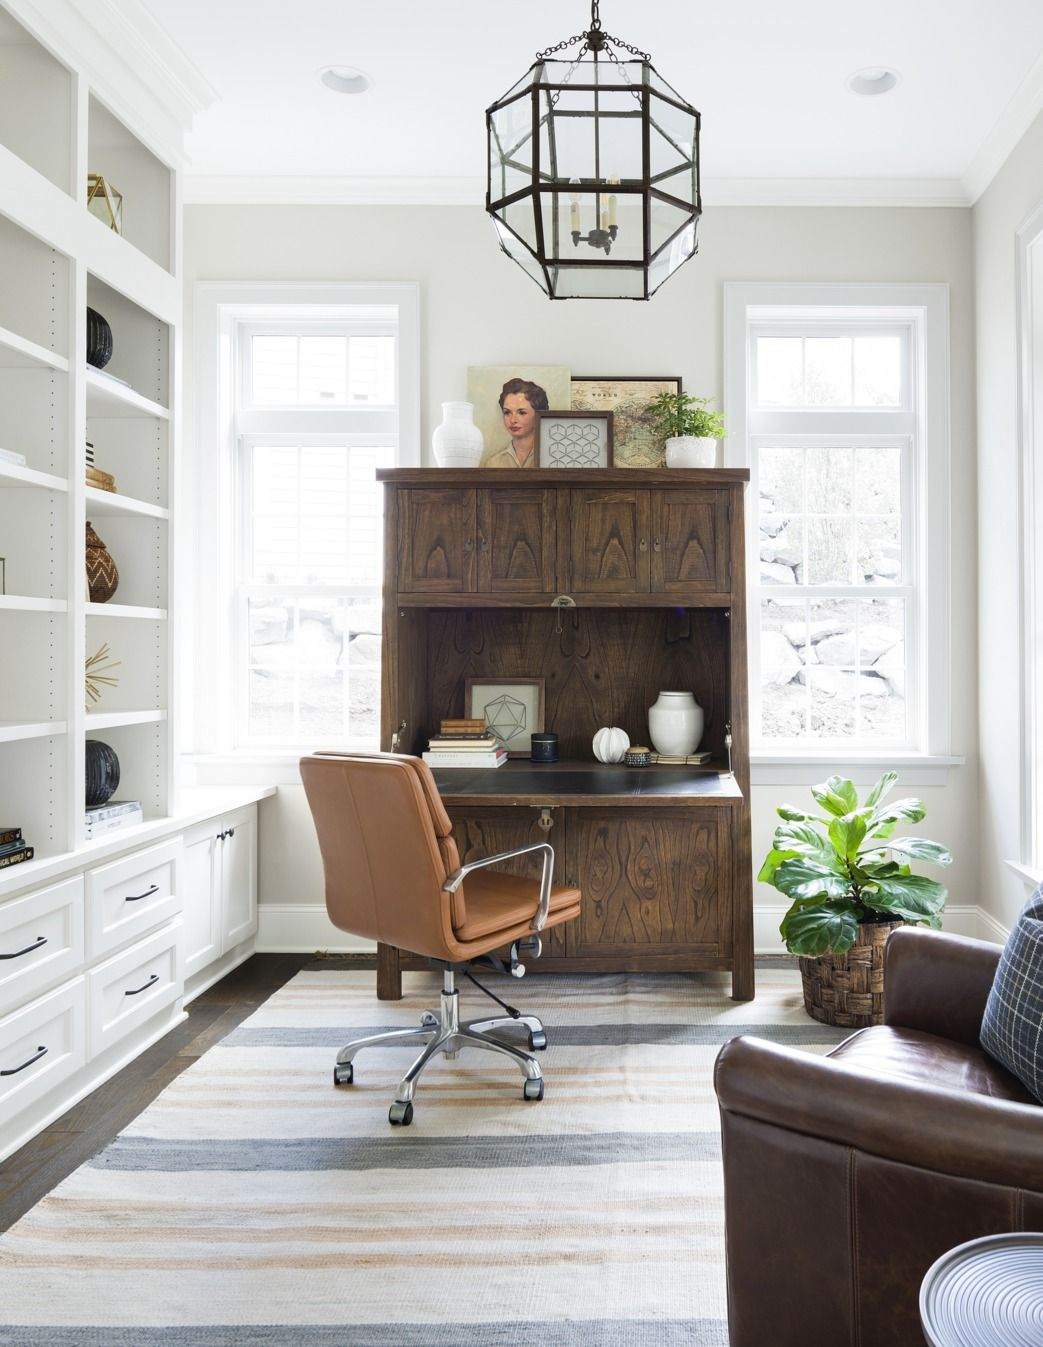 30 Sunroom Decorating Ideas - Best Designs for Sun Rooms